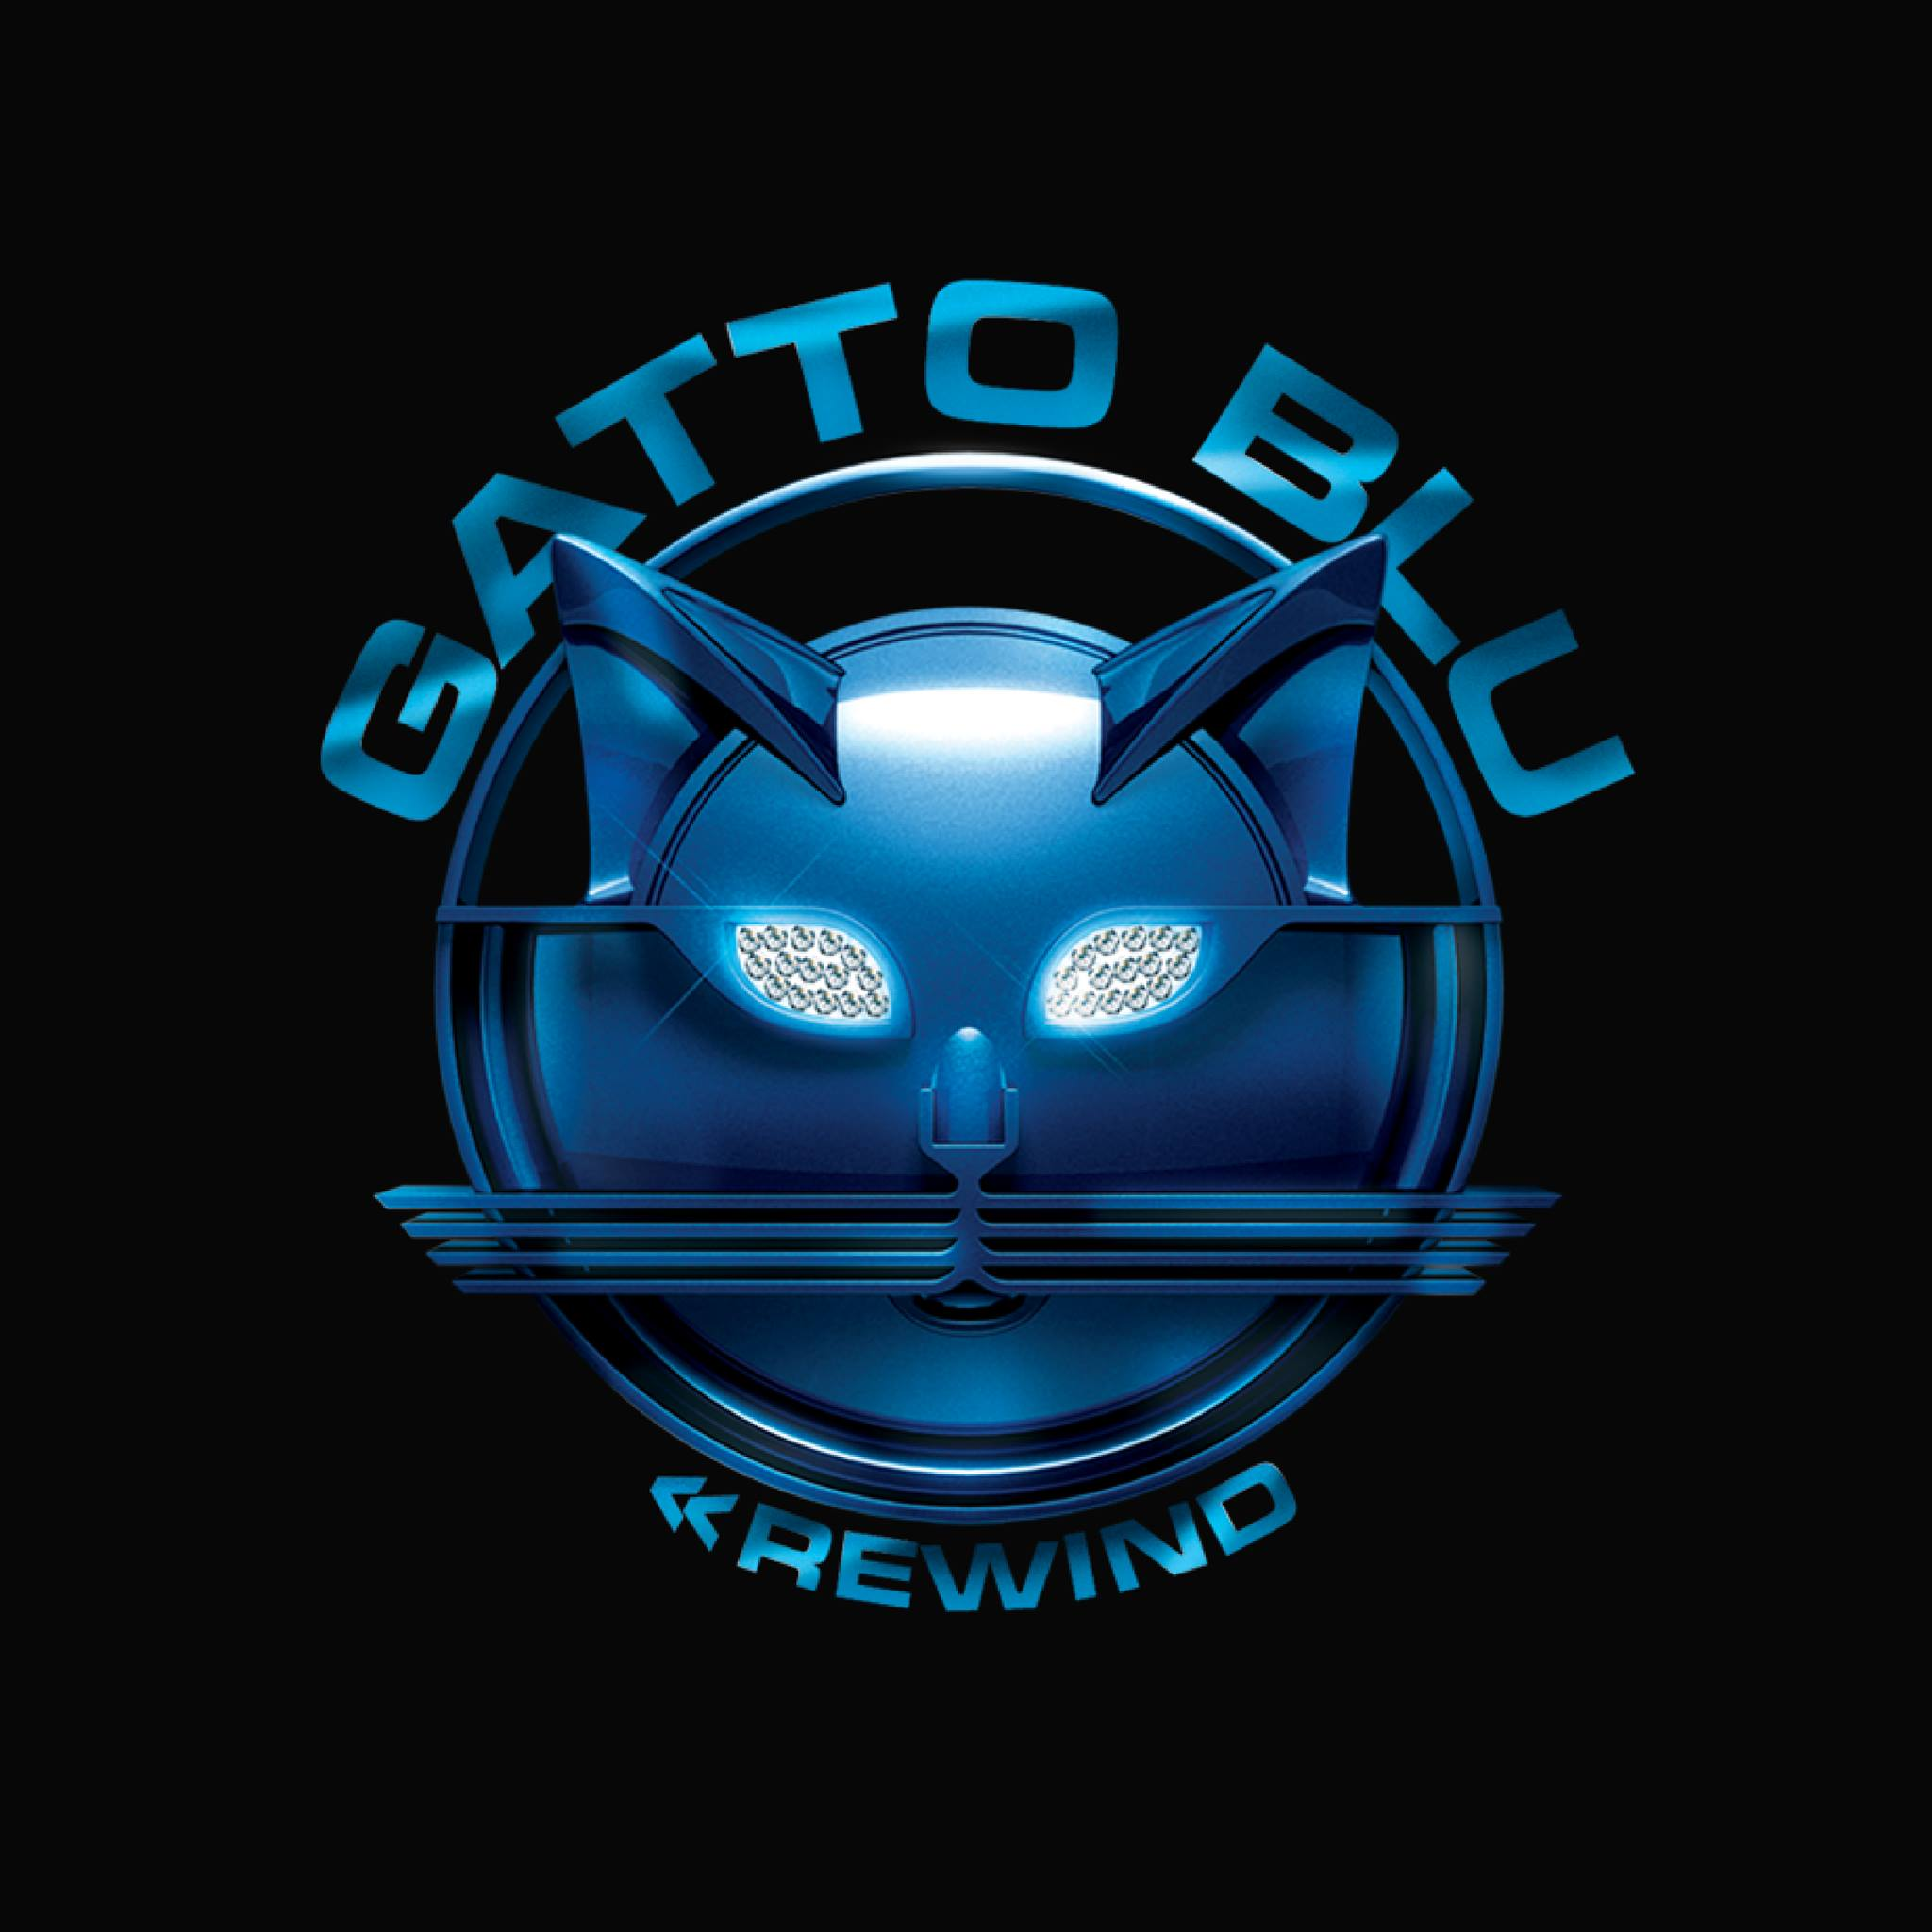 Discoteca Gatto Blu Civitanova Marche Glitter 2020